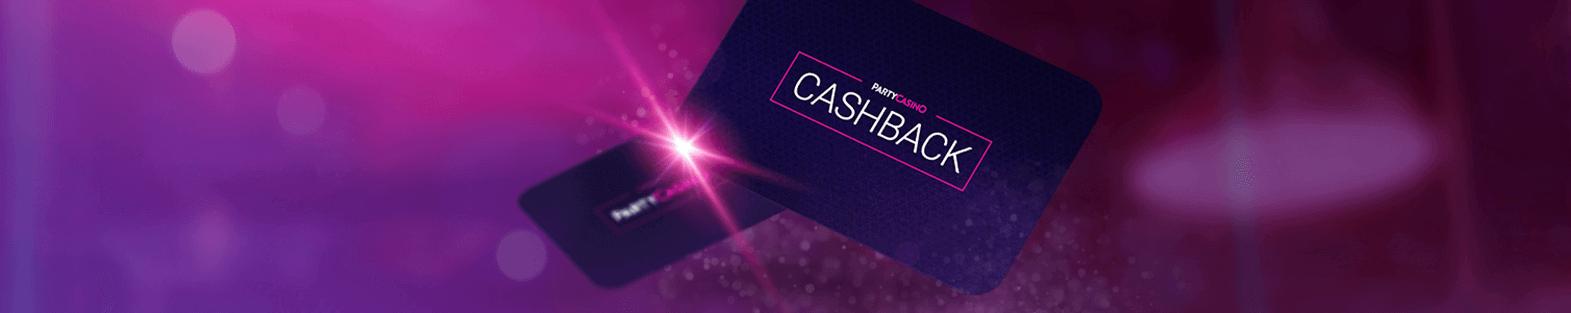 PartyCasino Cashback